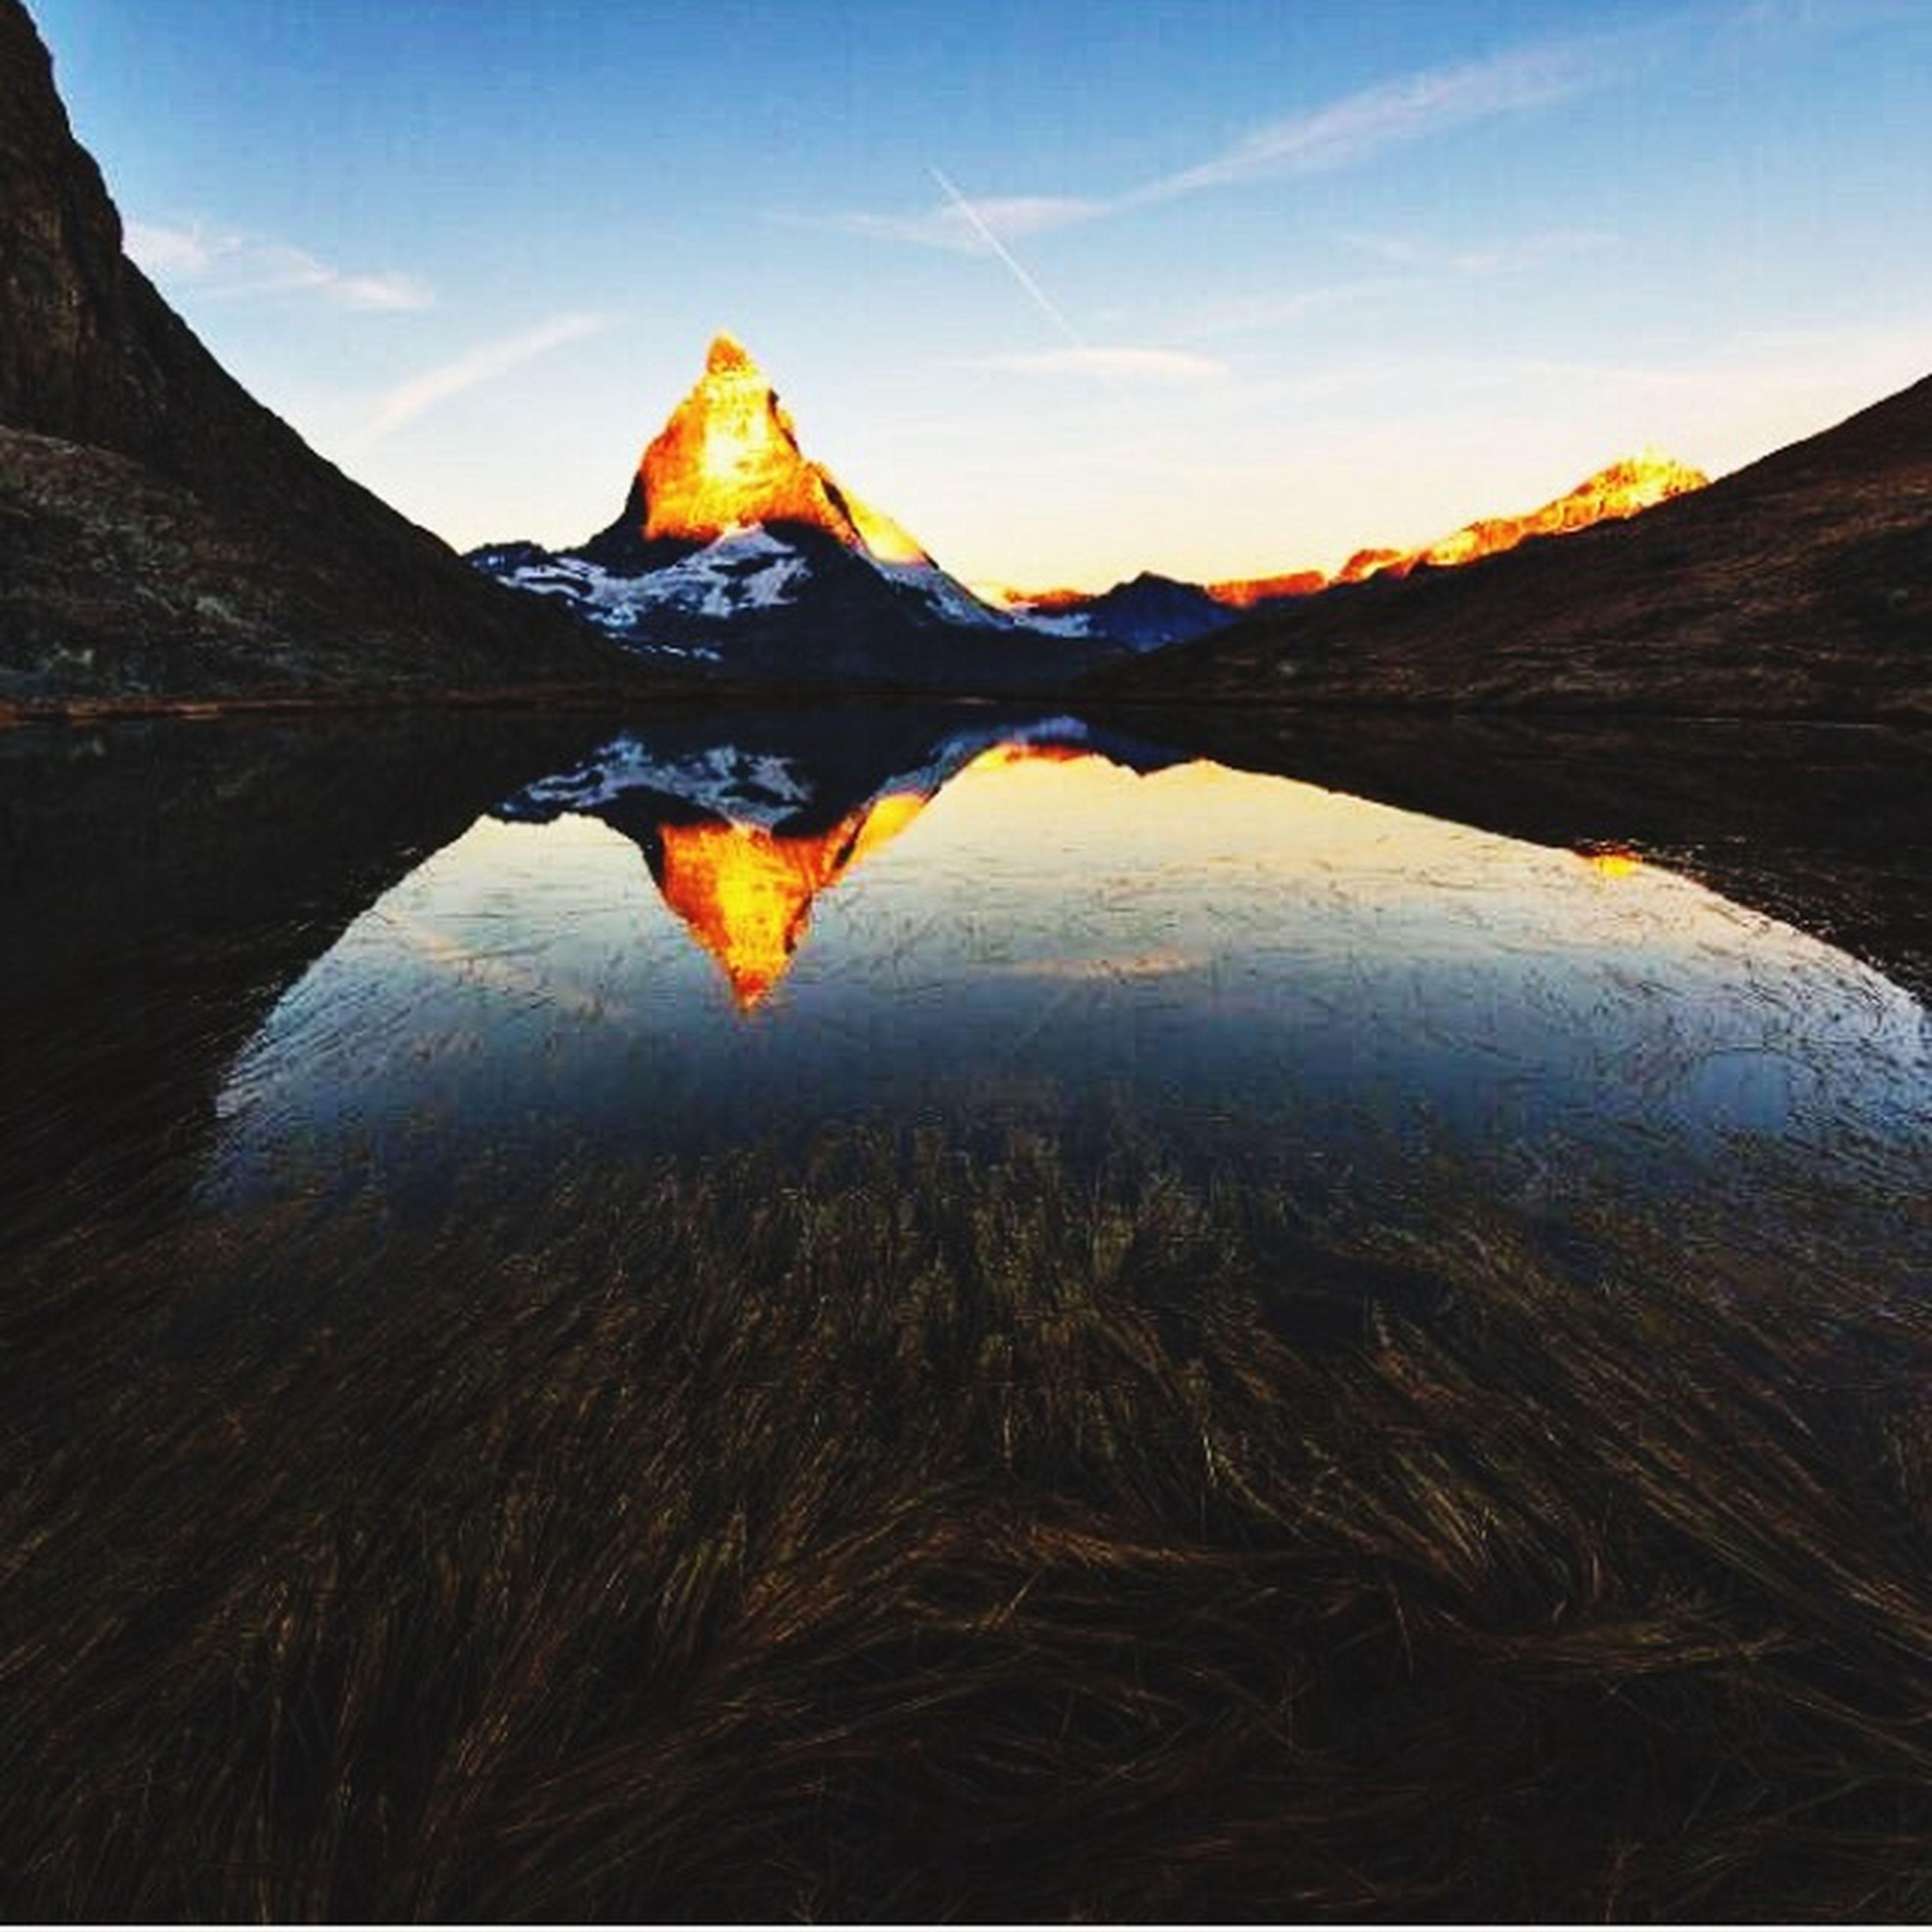 water, mountain, tranquility, lake, tranquil scene, beauty in nature, reflection, sky, scenics, nature, season, yellow, autumn, landscape, mountain range, idyllic, non-urban scene, outdoors, day, close-up